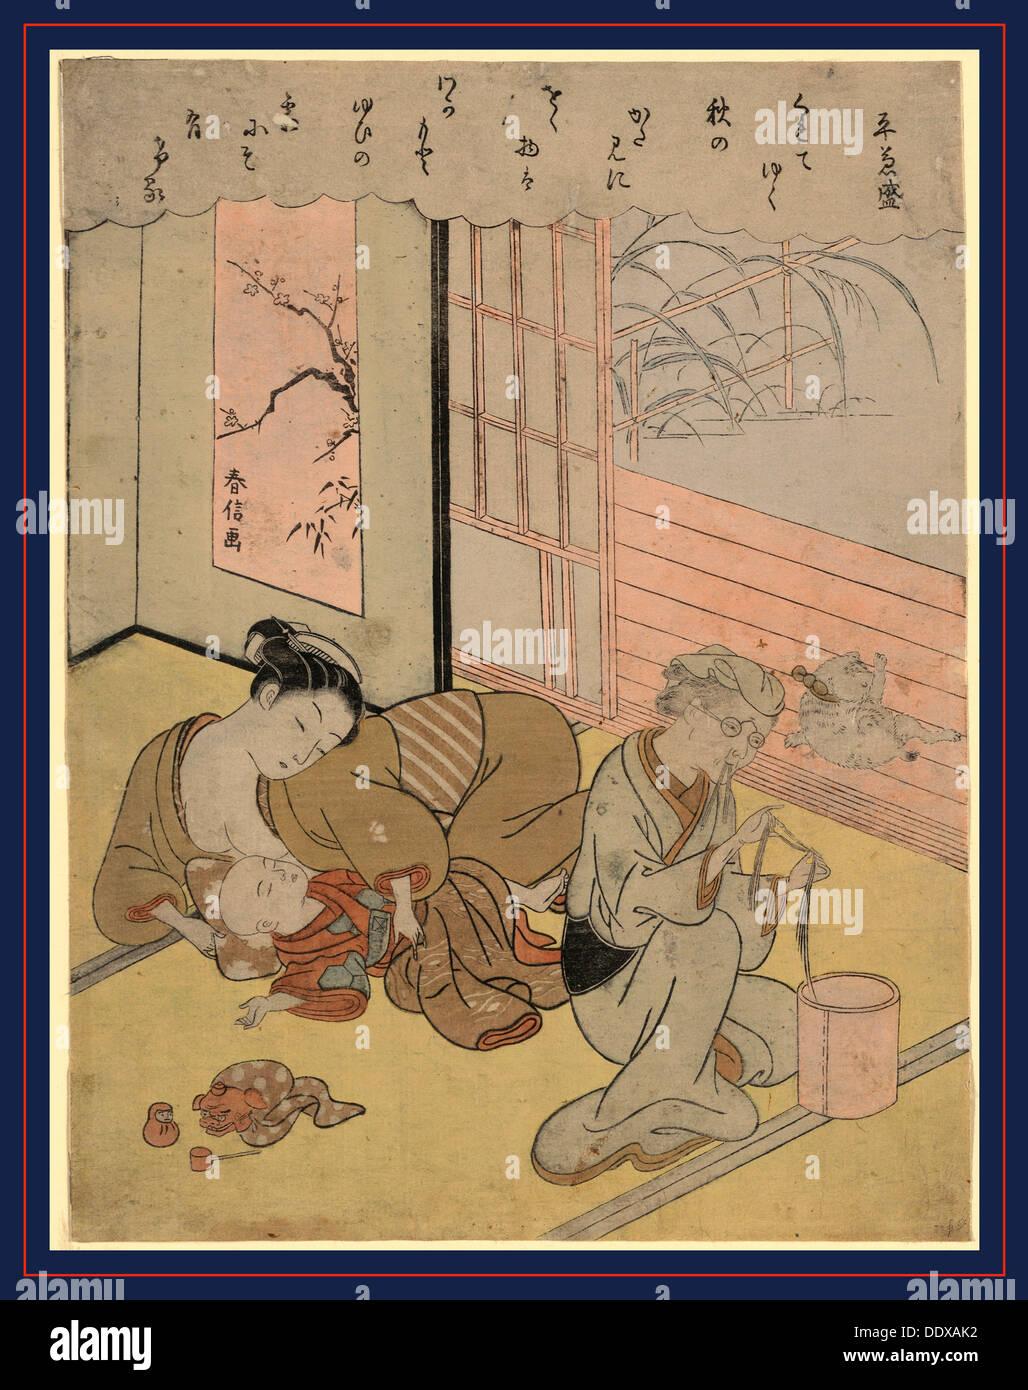 Taira no Kanemori, Suzuki [between 1767 and 1769], 1 print : woodcut, color ; 27 x 20.5 cm., Print shows a mother reclining - Stock Image